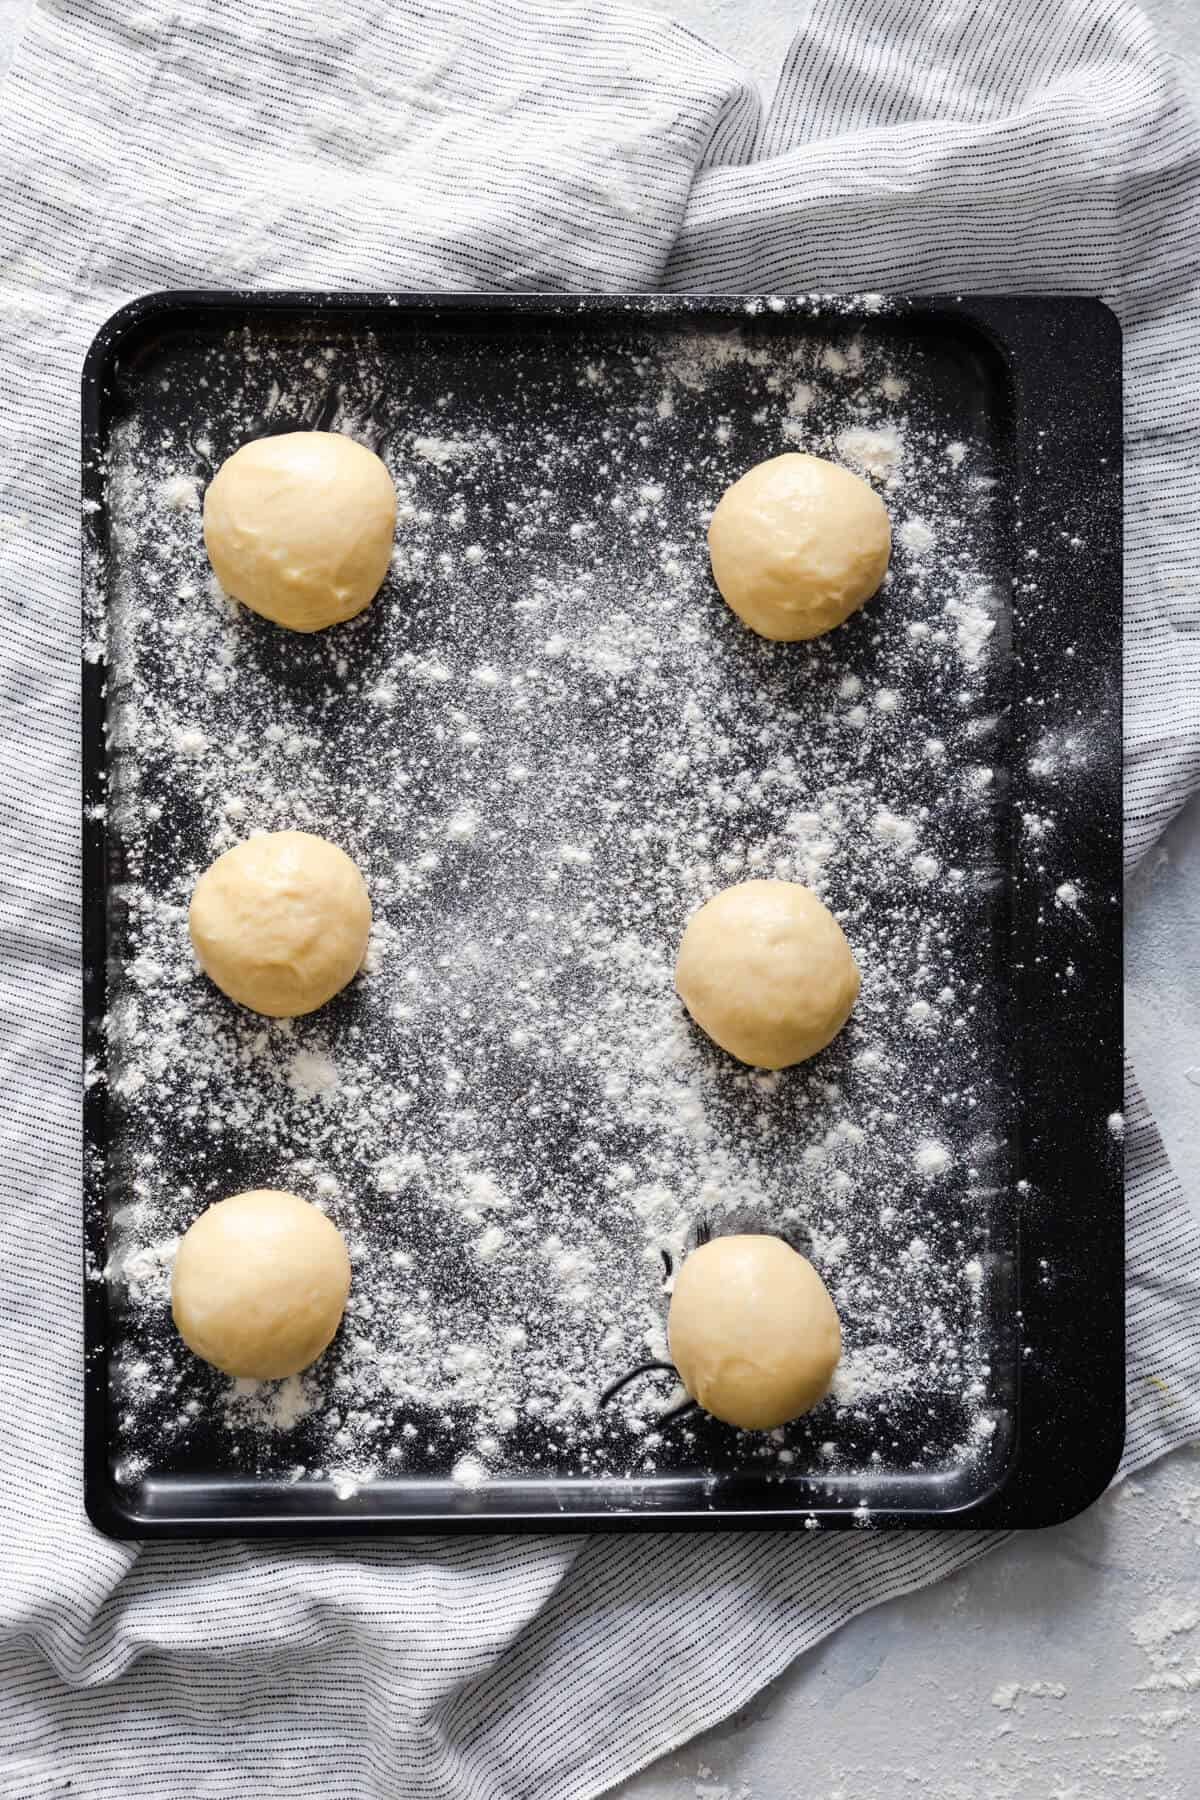 top view of 6 dough balls on a floured baking tray